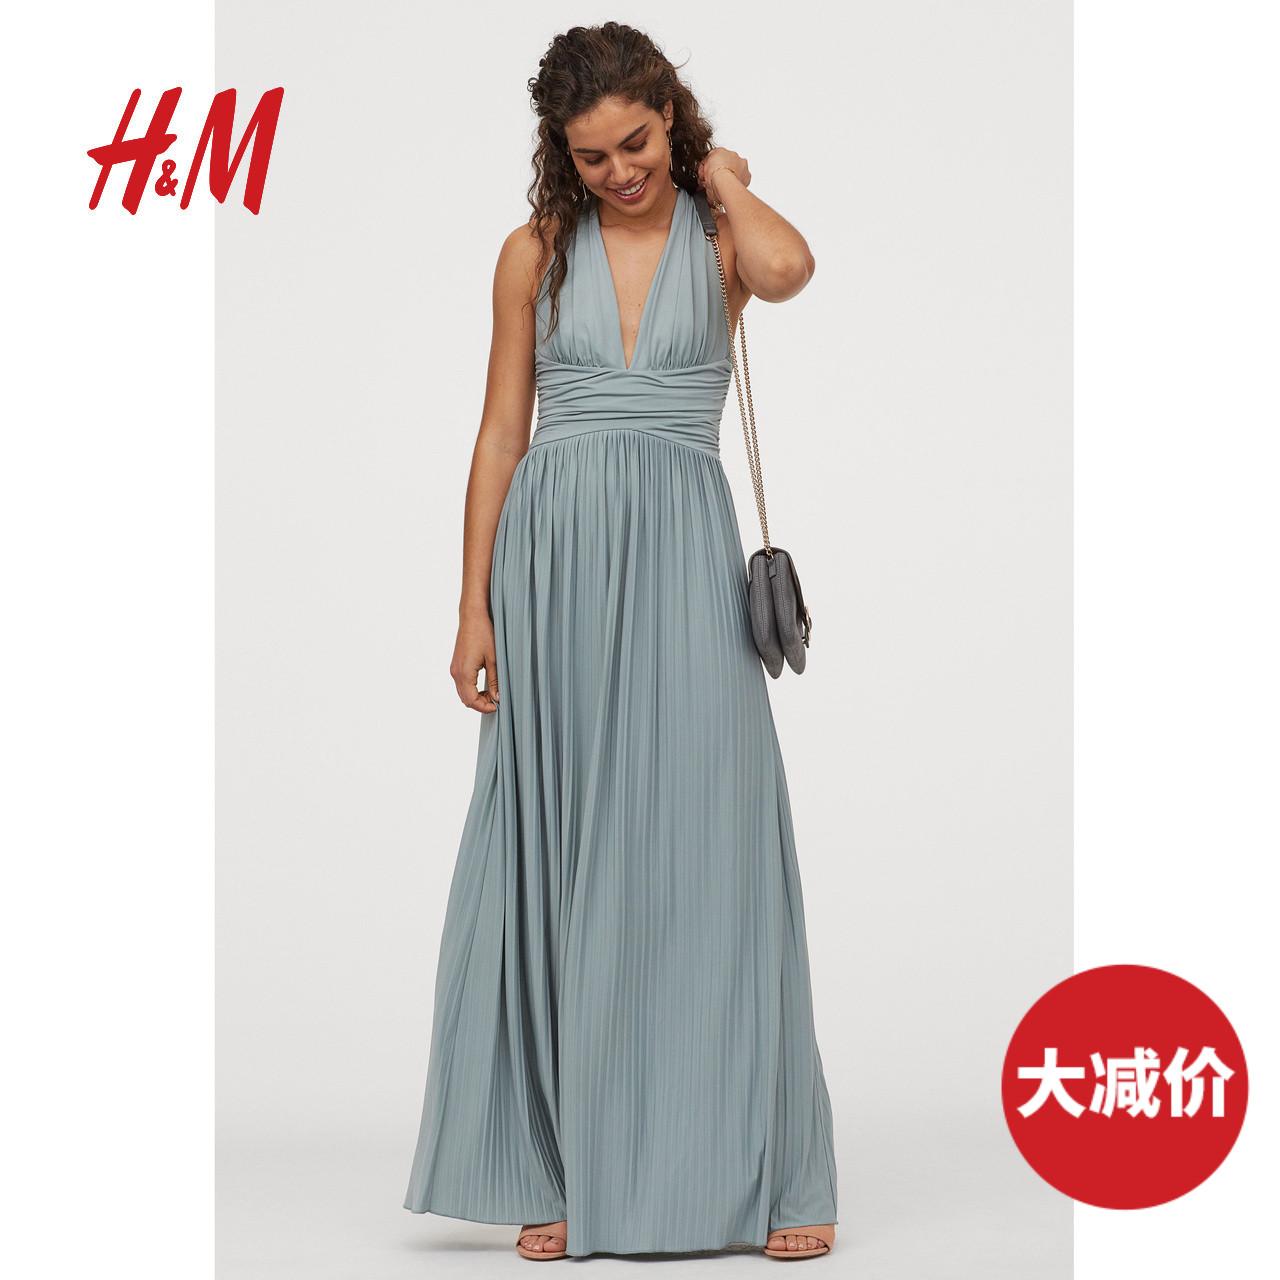 HM 女装女士新年战裙时尚名媛风v领垂坠感年会长款连衣裙 0718086